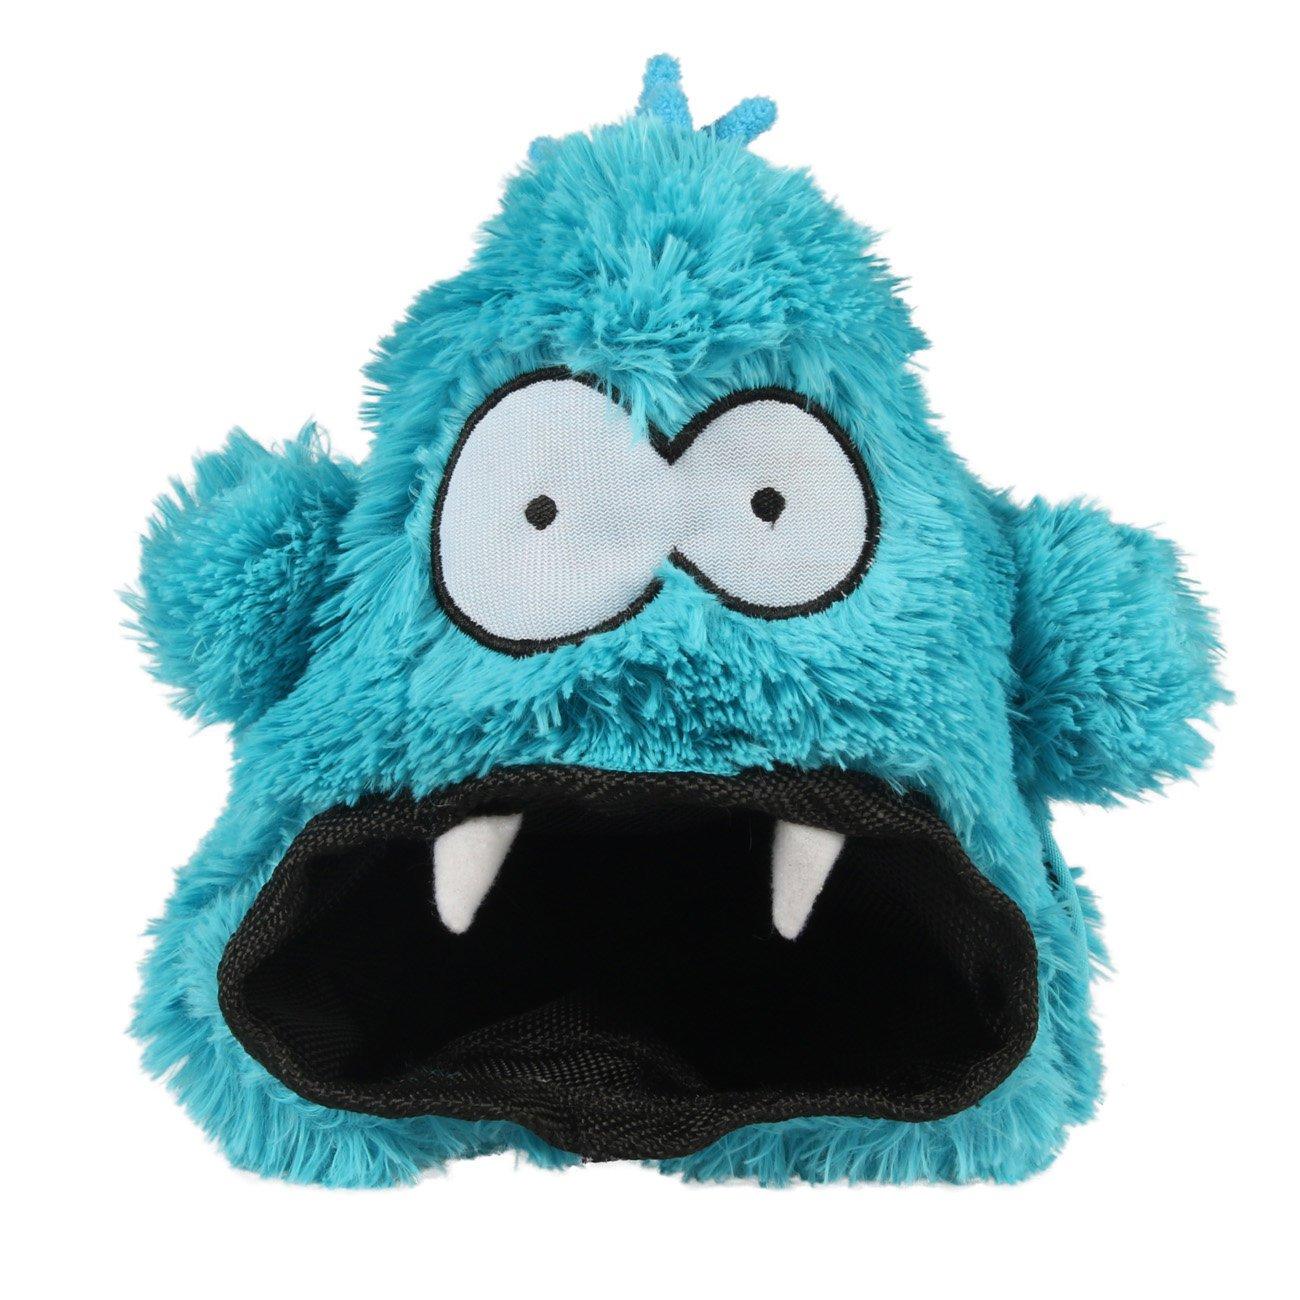 Coockoo Plüsch Monster Hundespielzeug, Bild 5